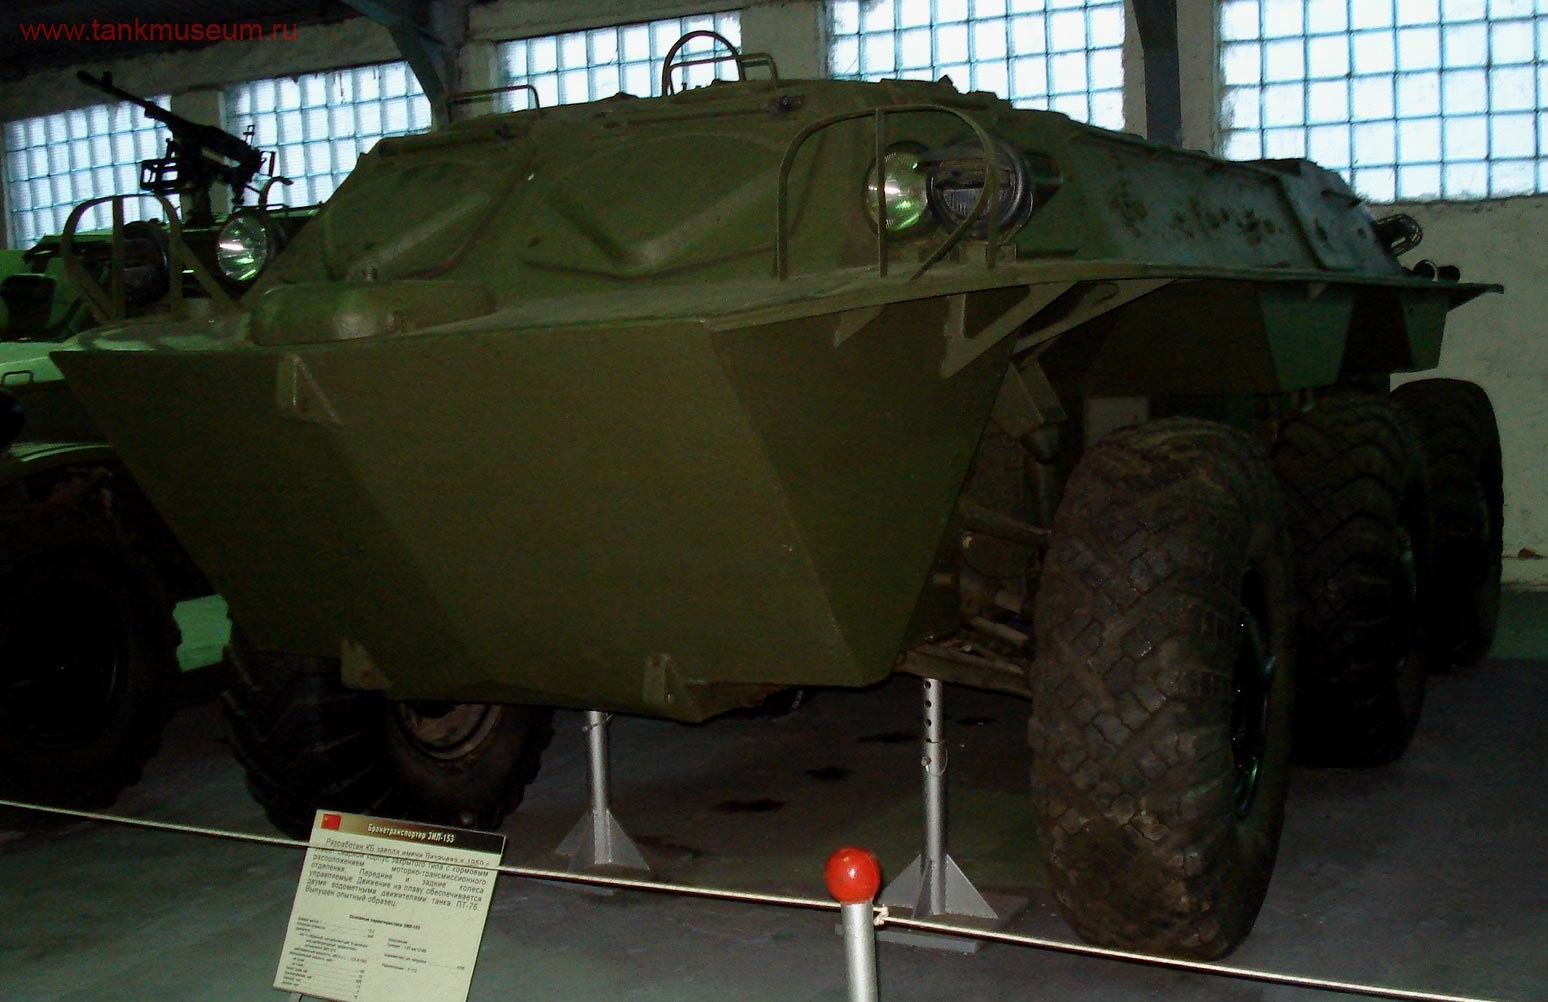 Бронетранспортер ЗИЛ-153, танковый музей Кубинка